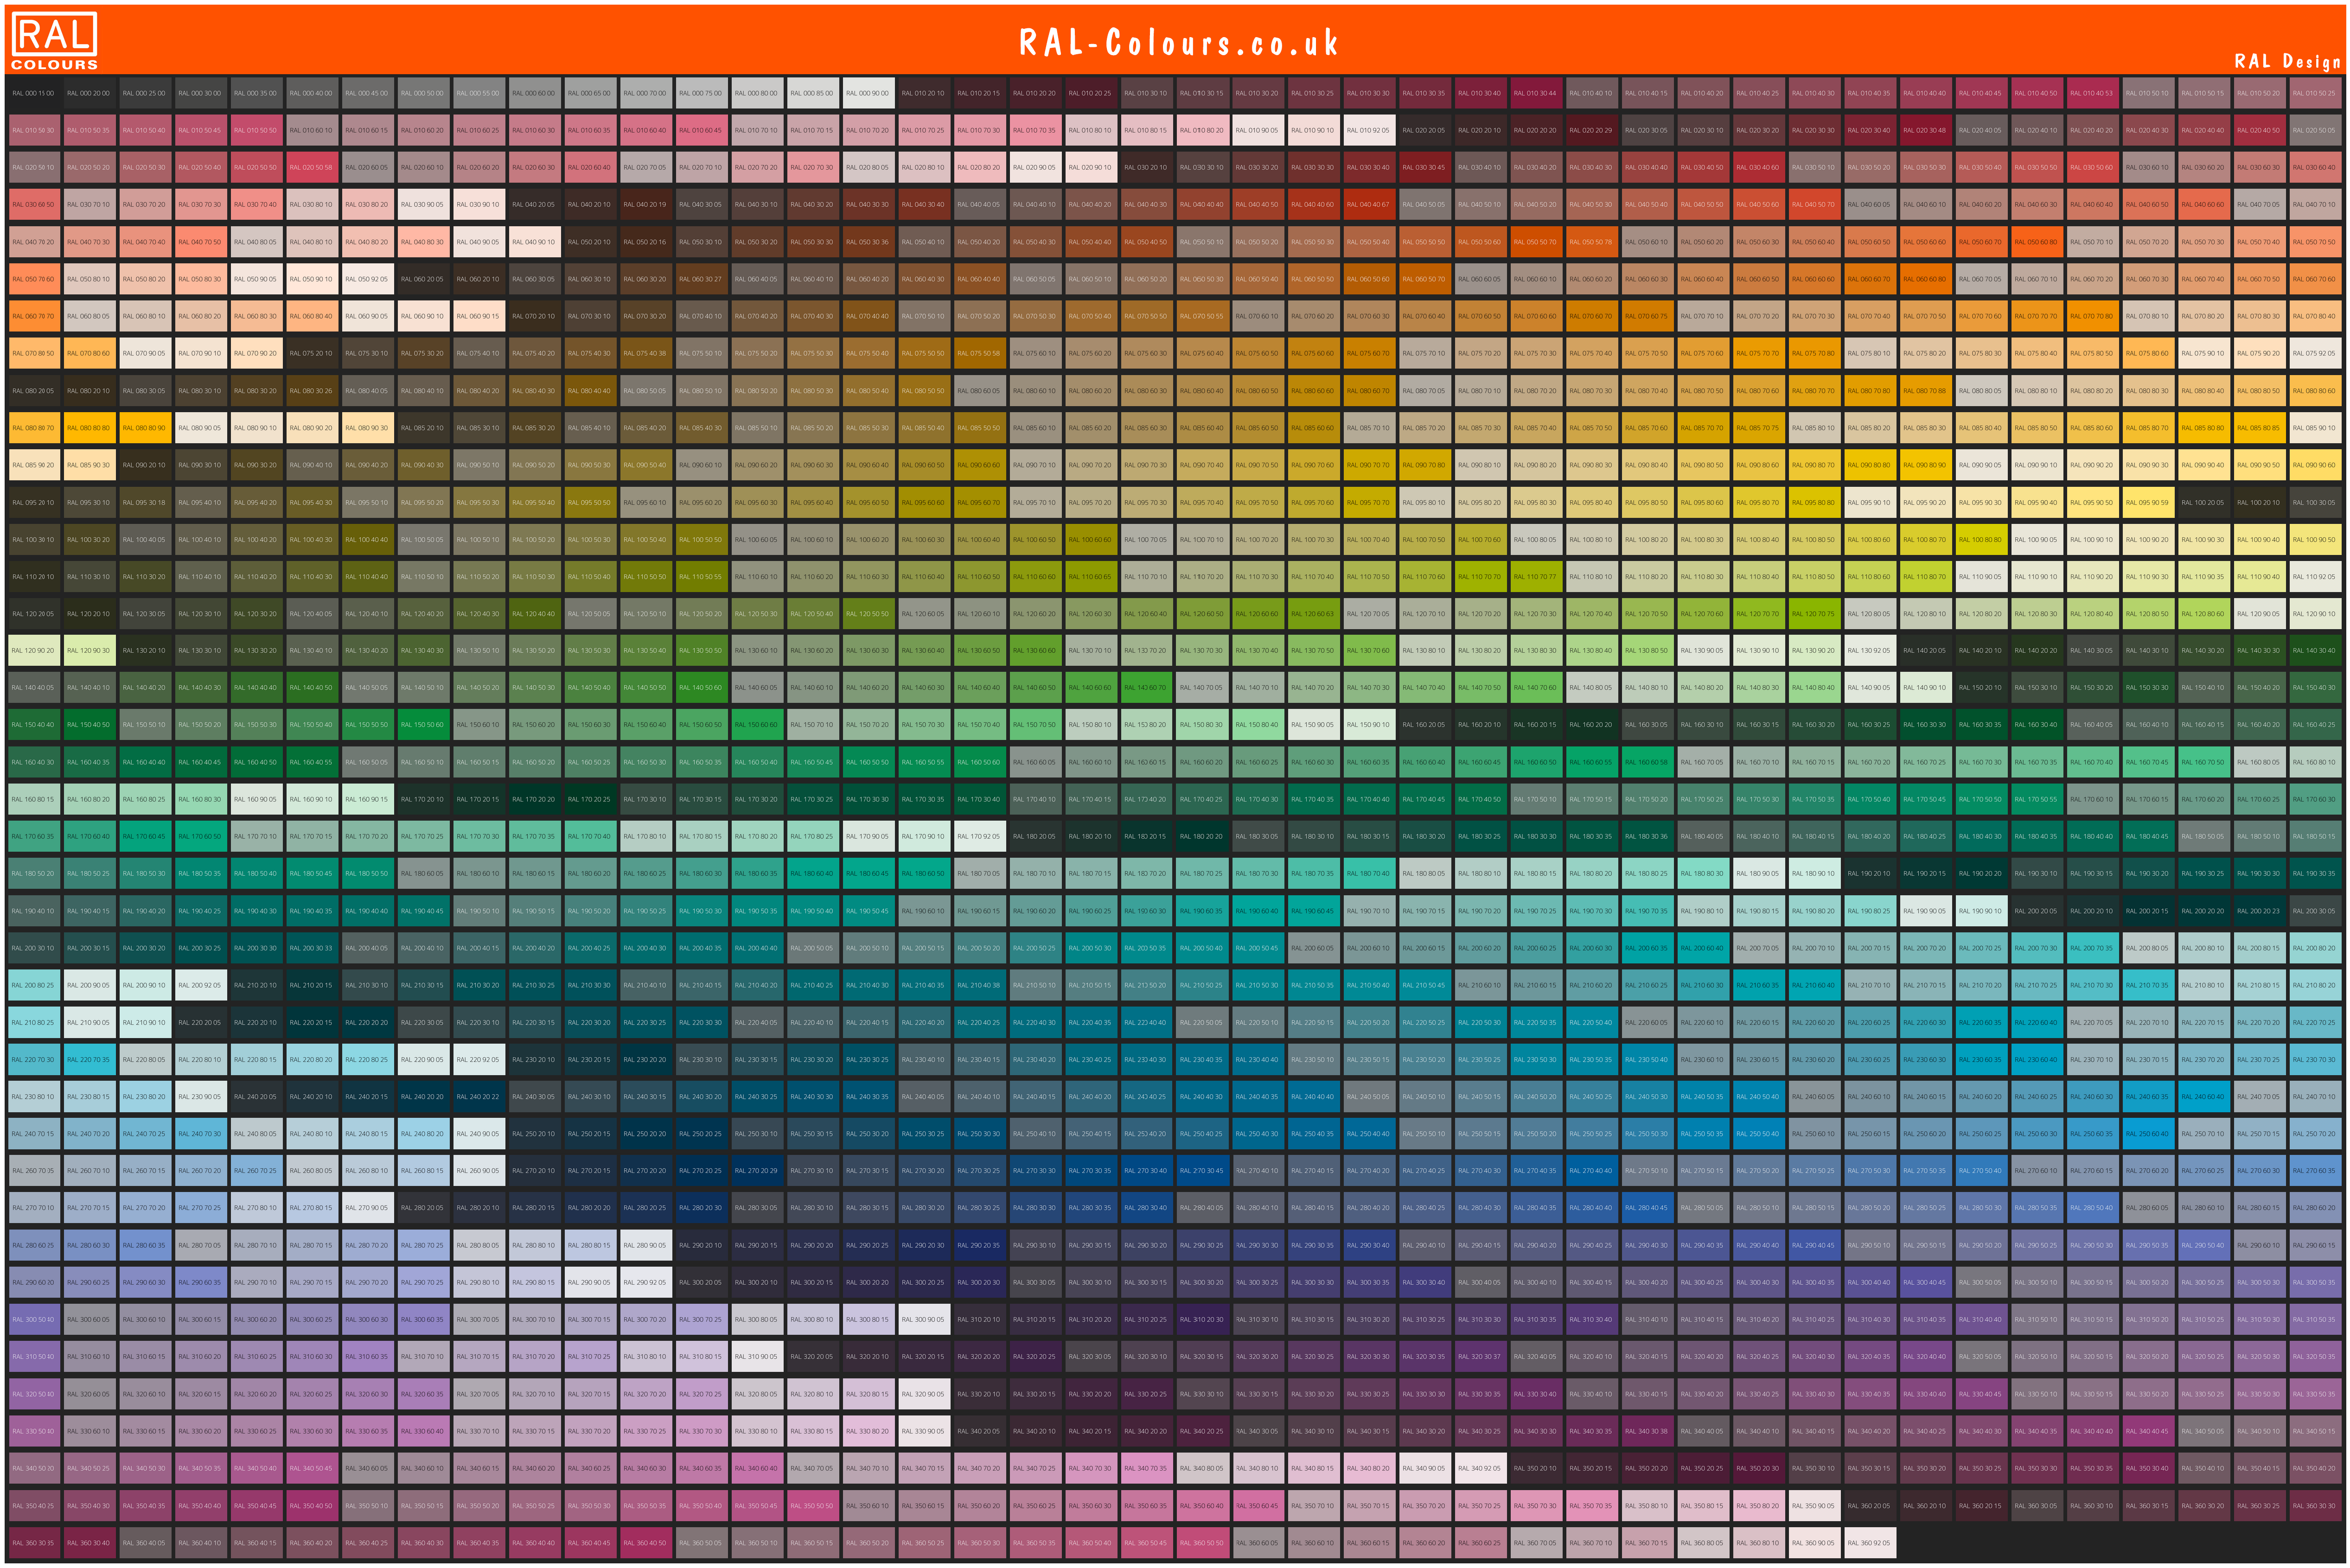 RAL Design colour chart